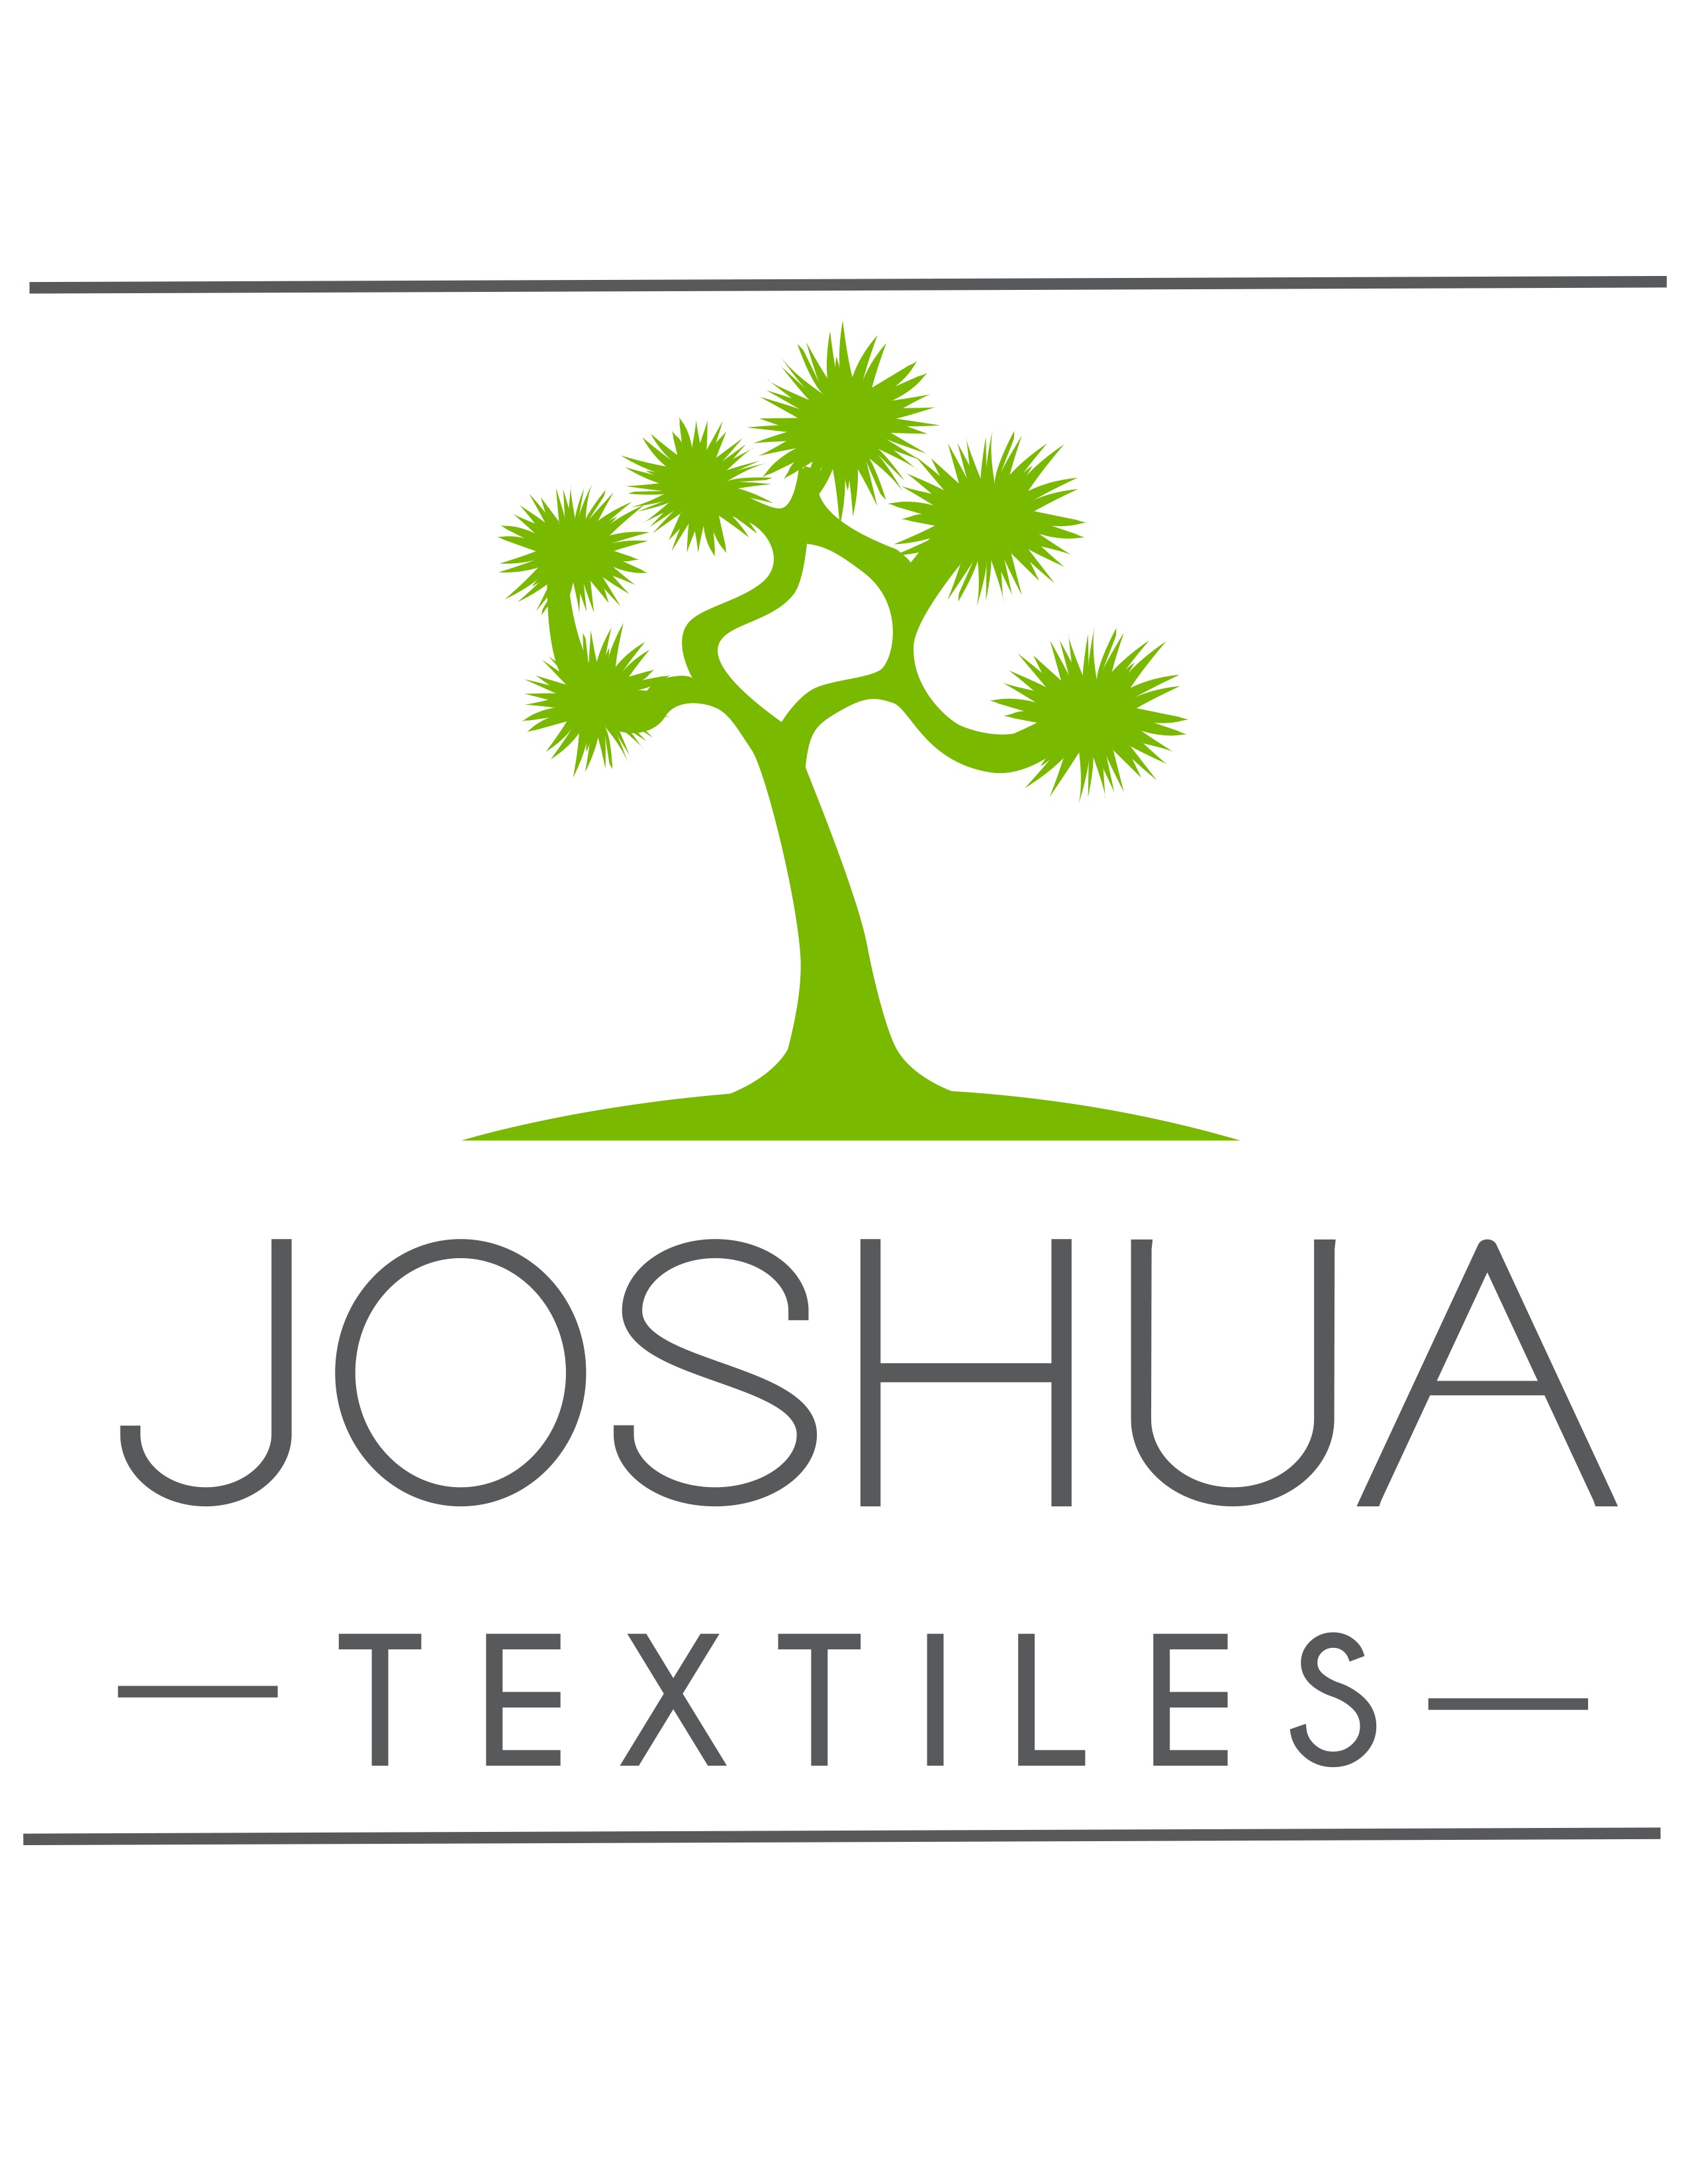 JoshuaTextiles